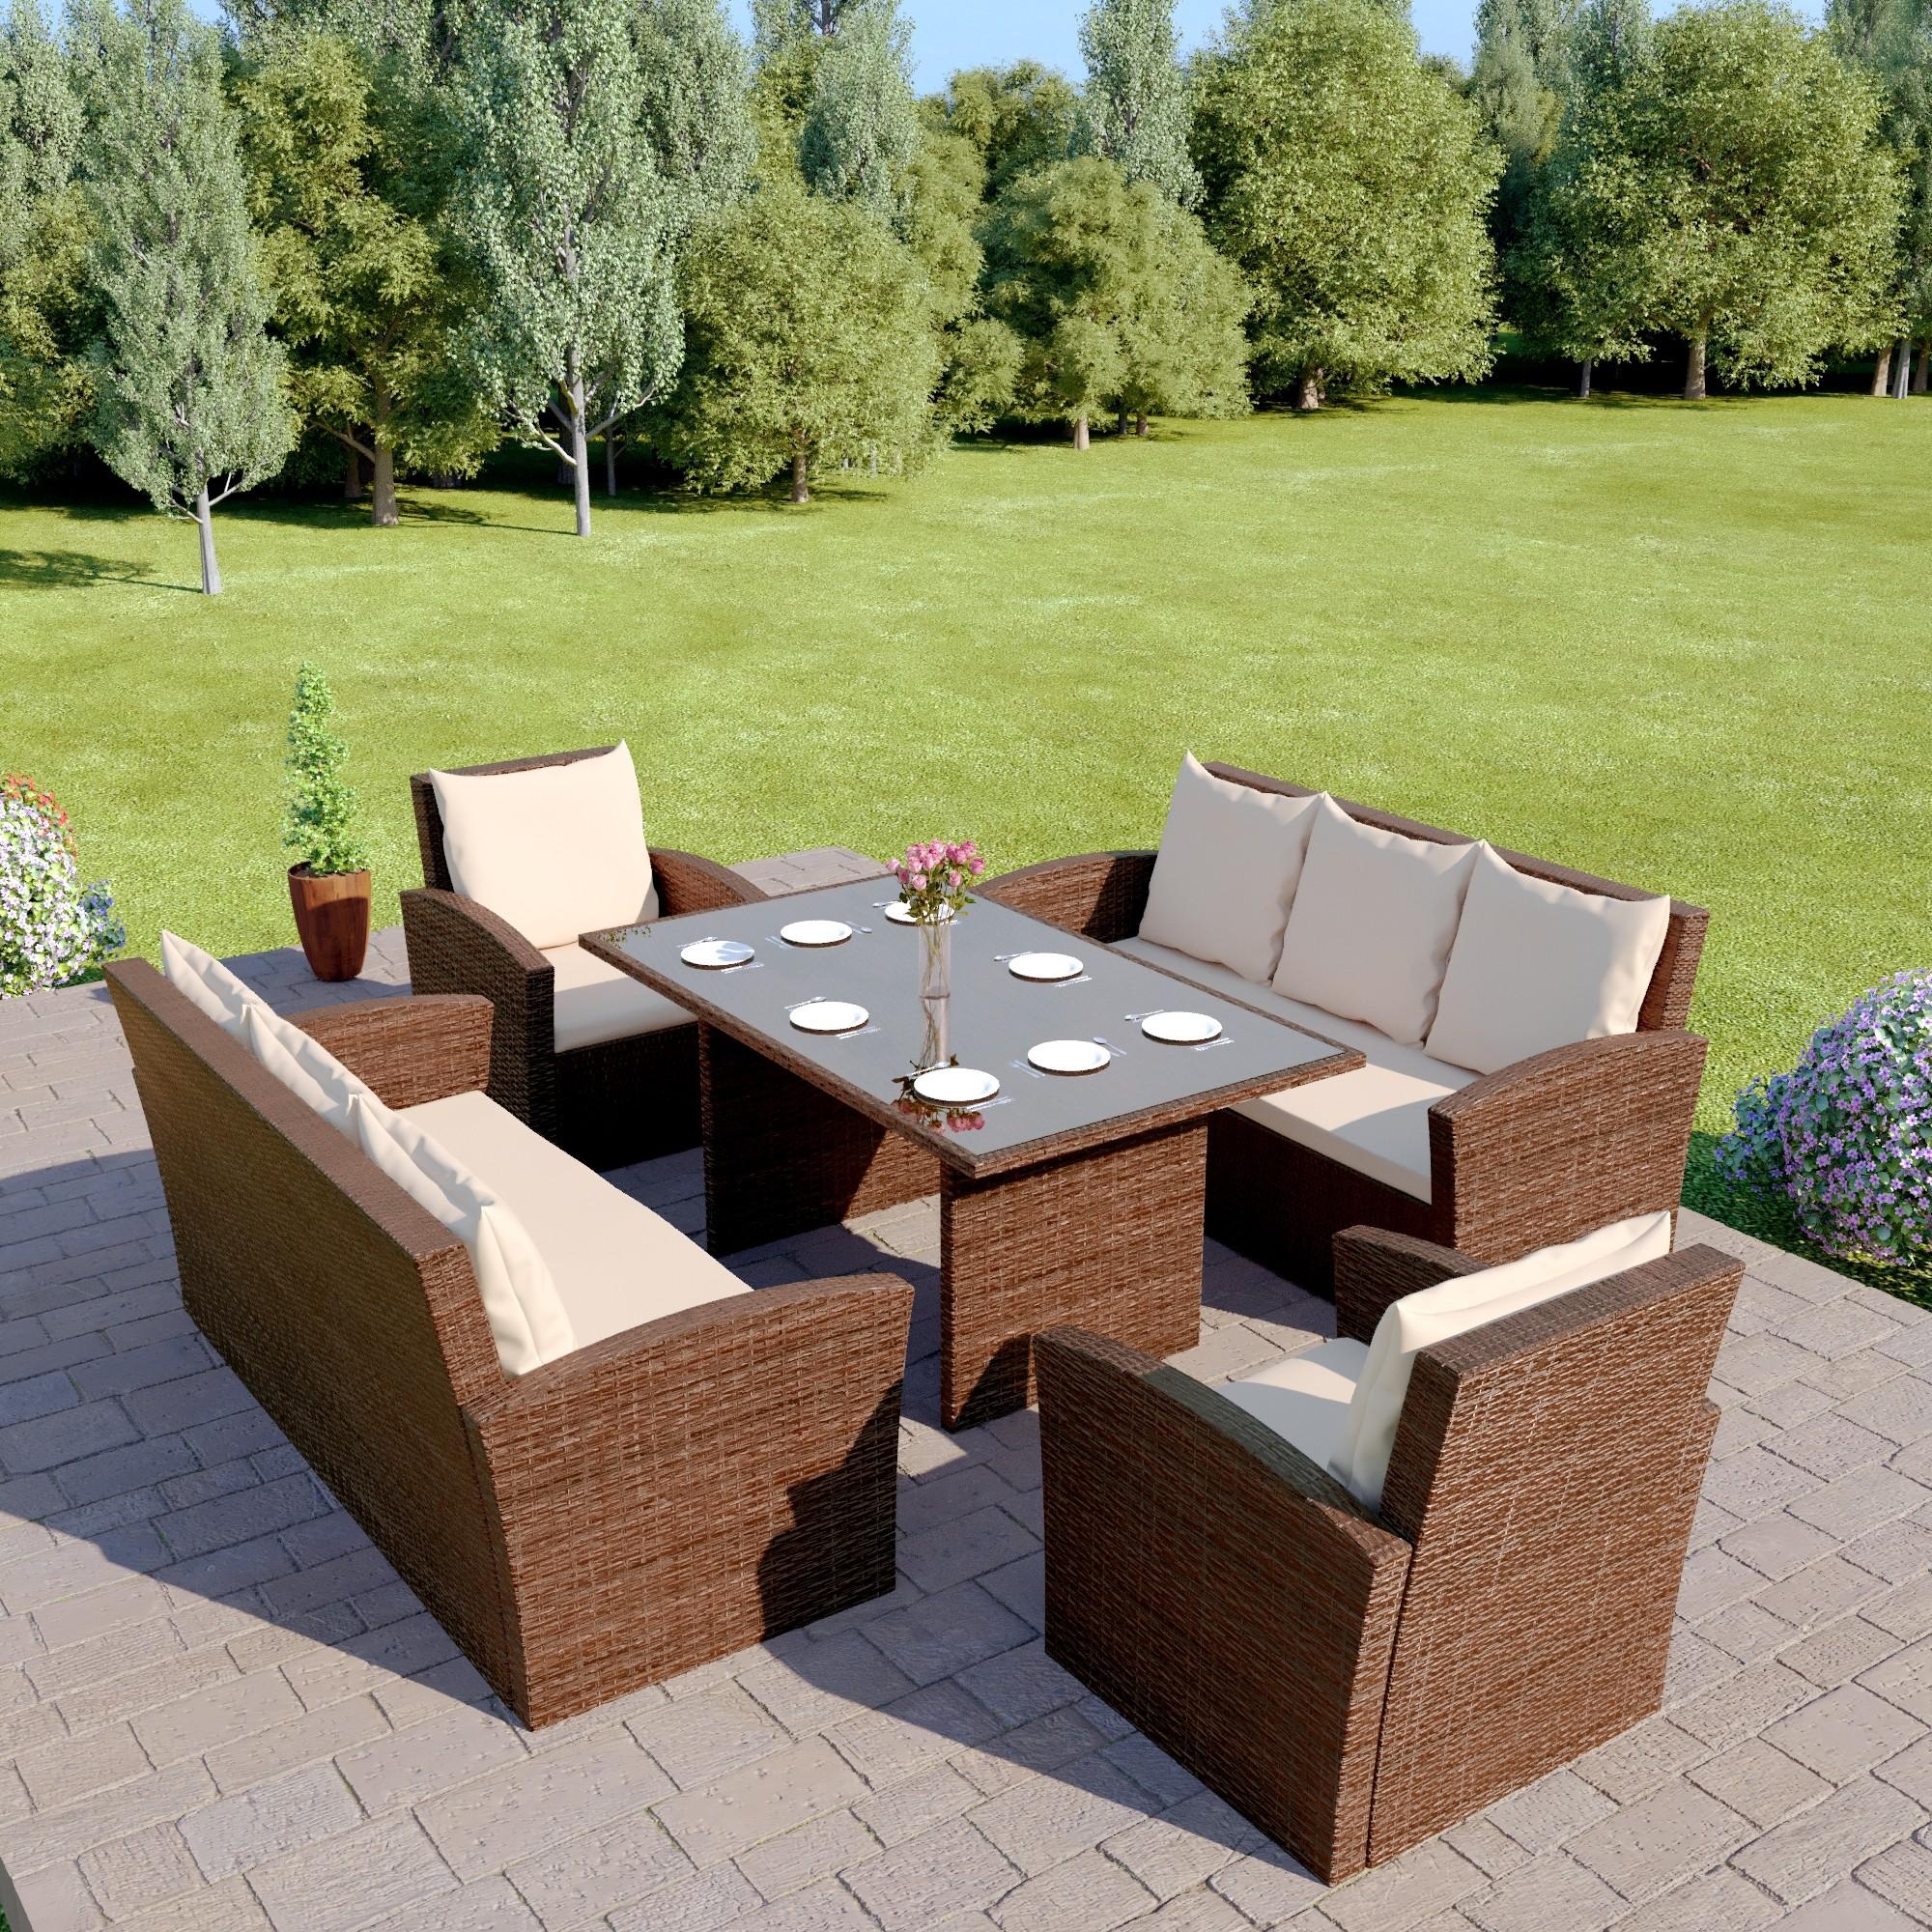 Garden dining set New Miami 8-seater garden furniture set in brown with bright cushions UQDFETG